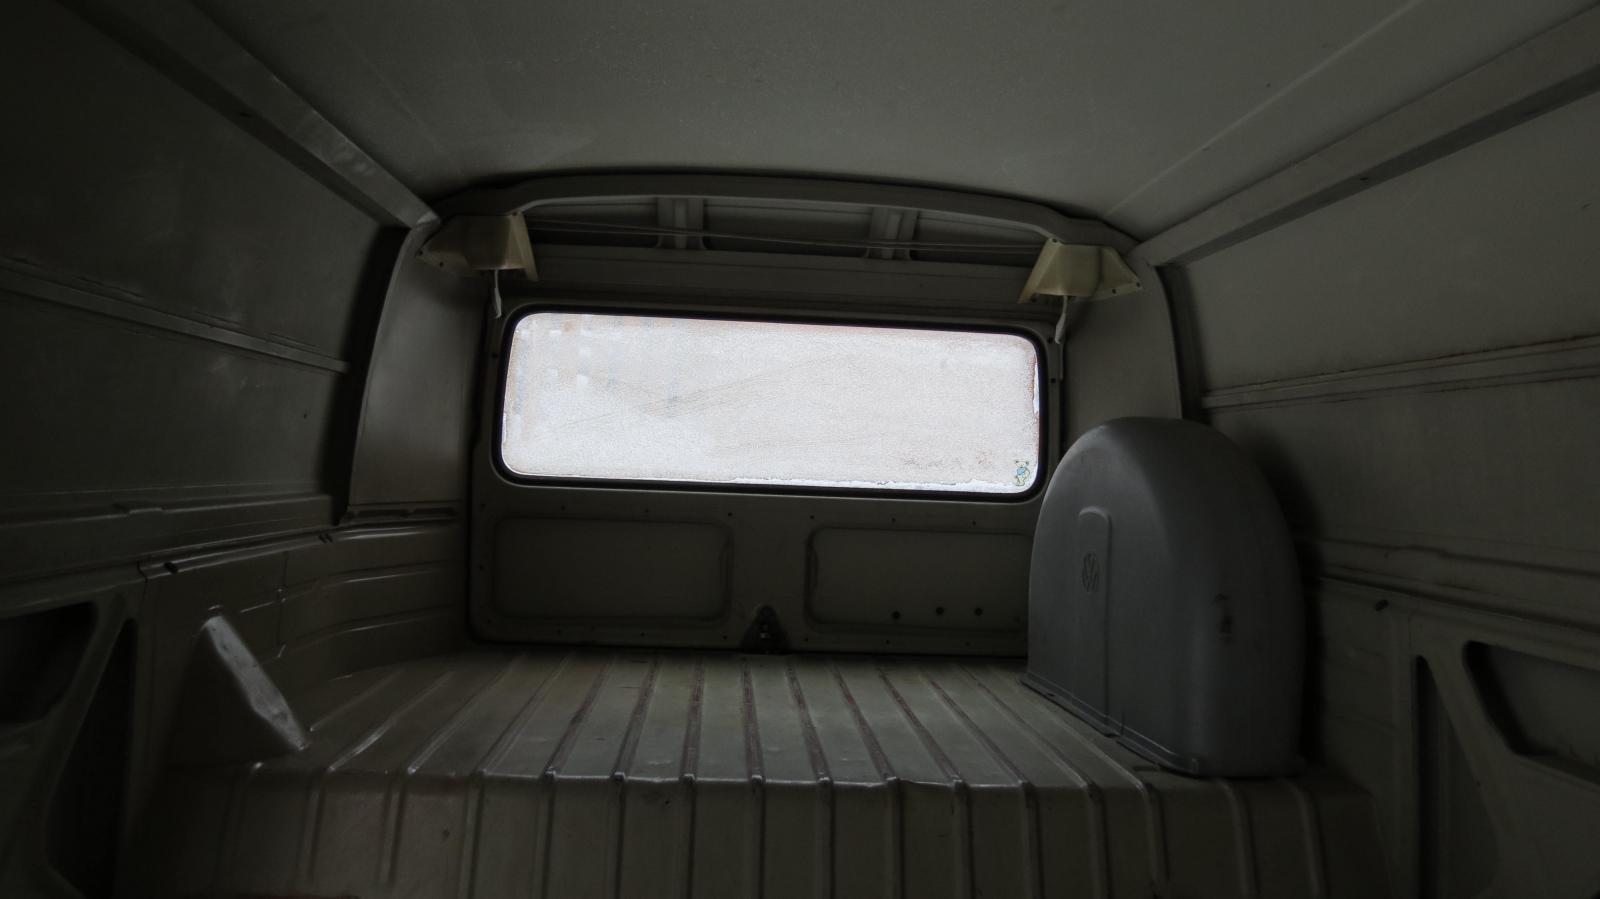 '71 Panelvan